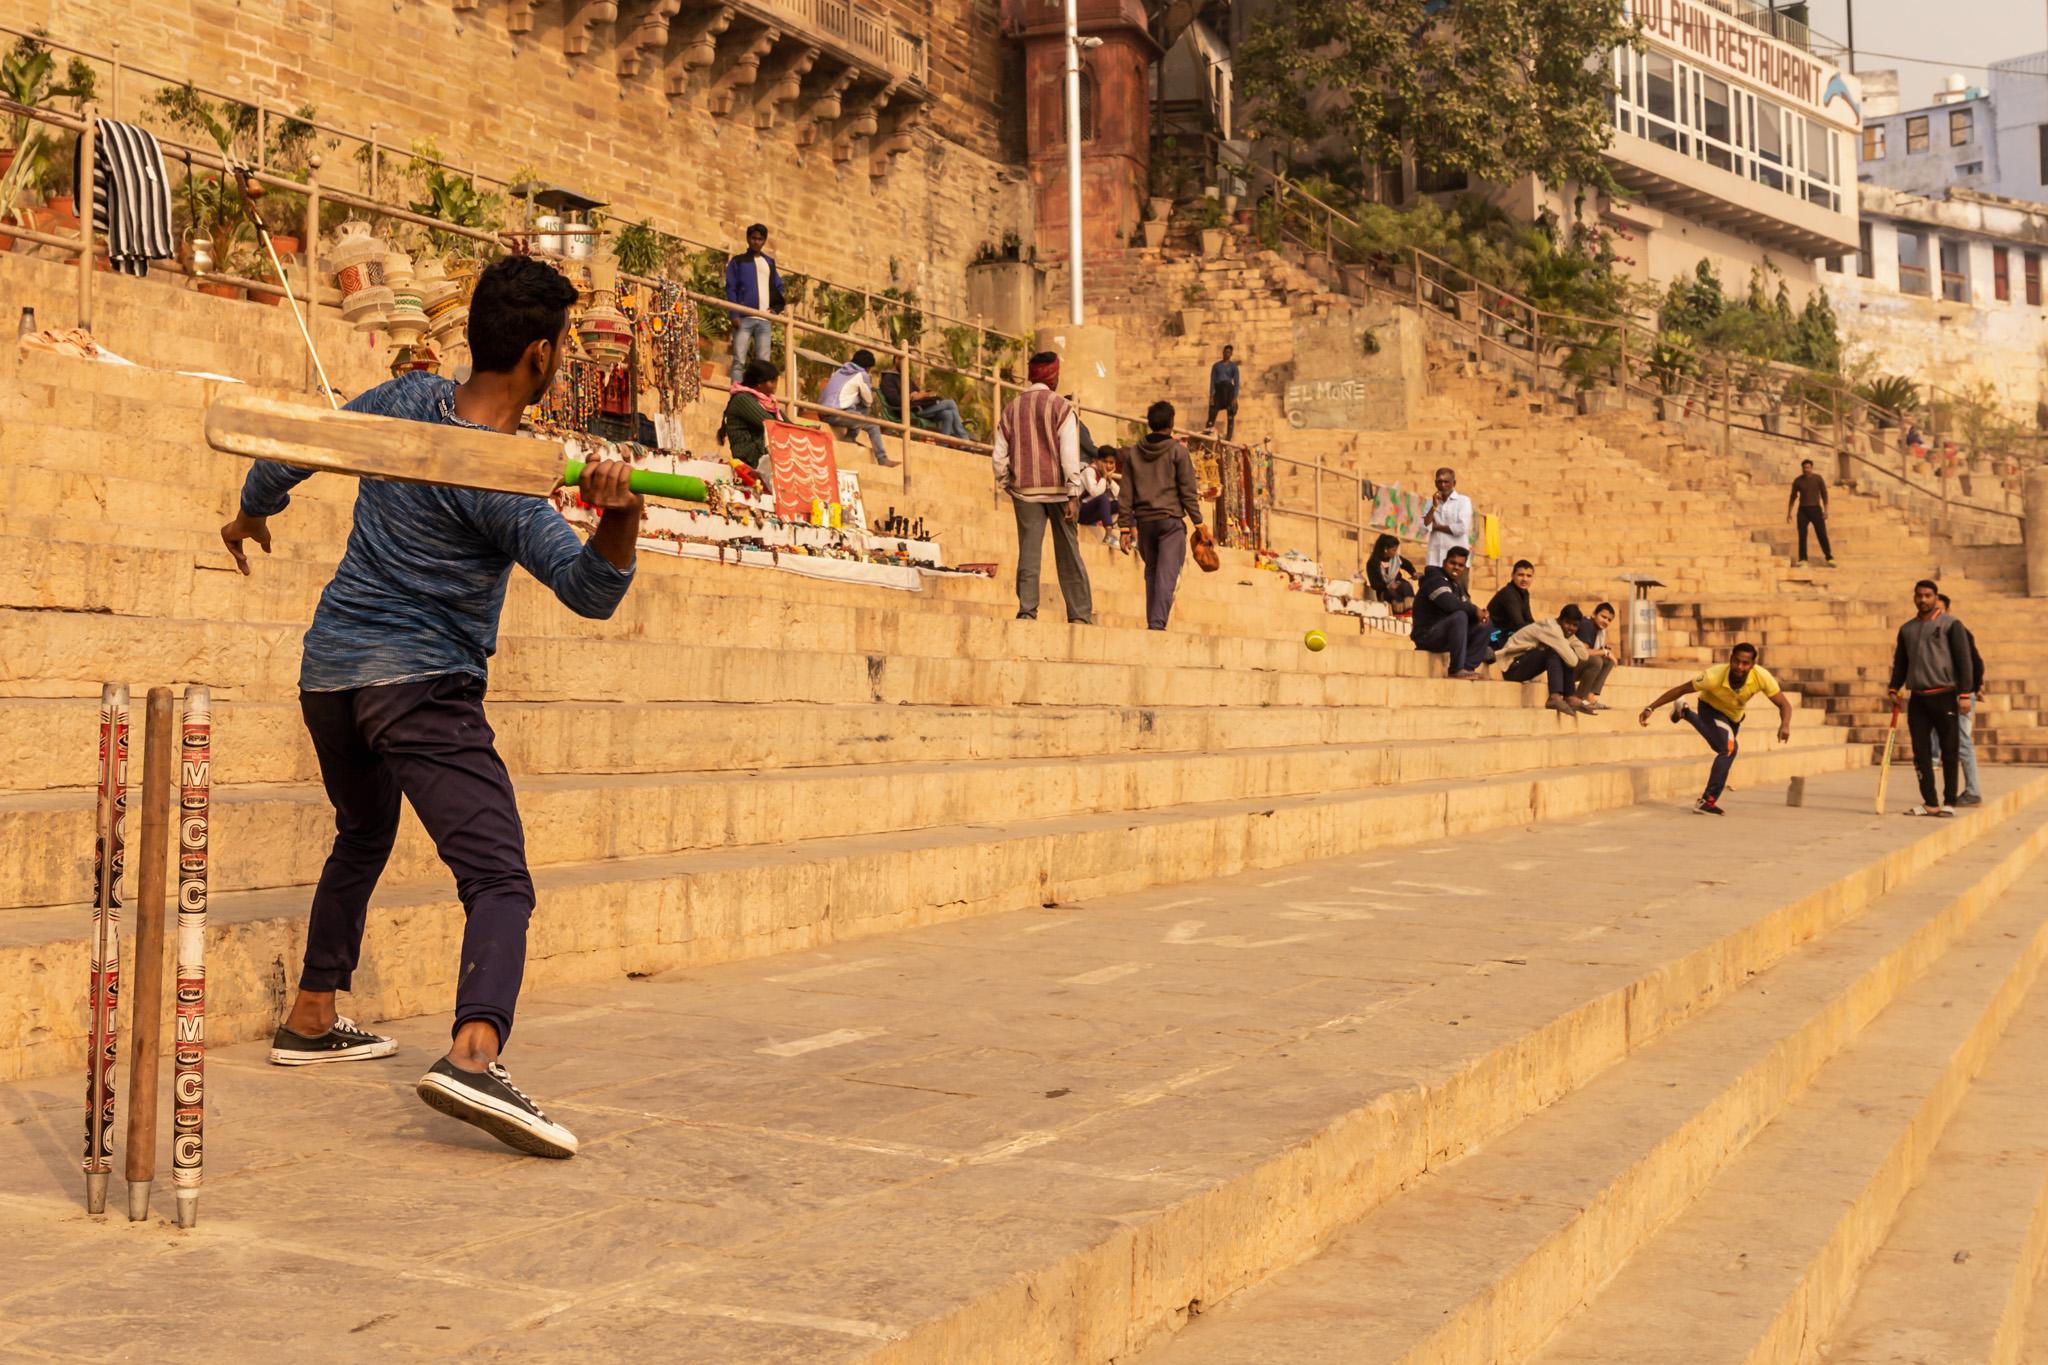 Street cricket players in Varanasi.